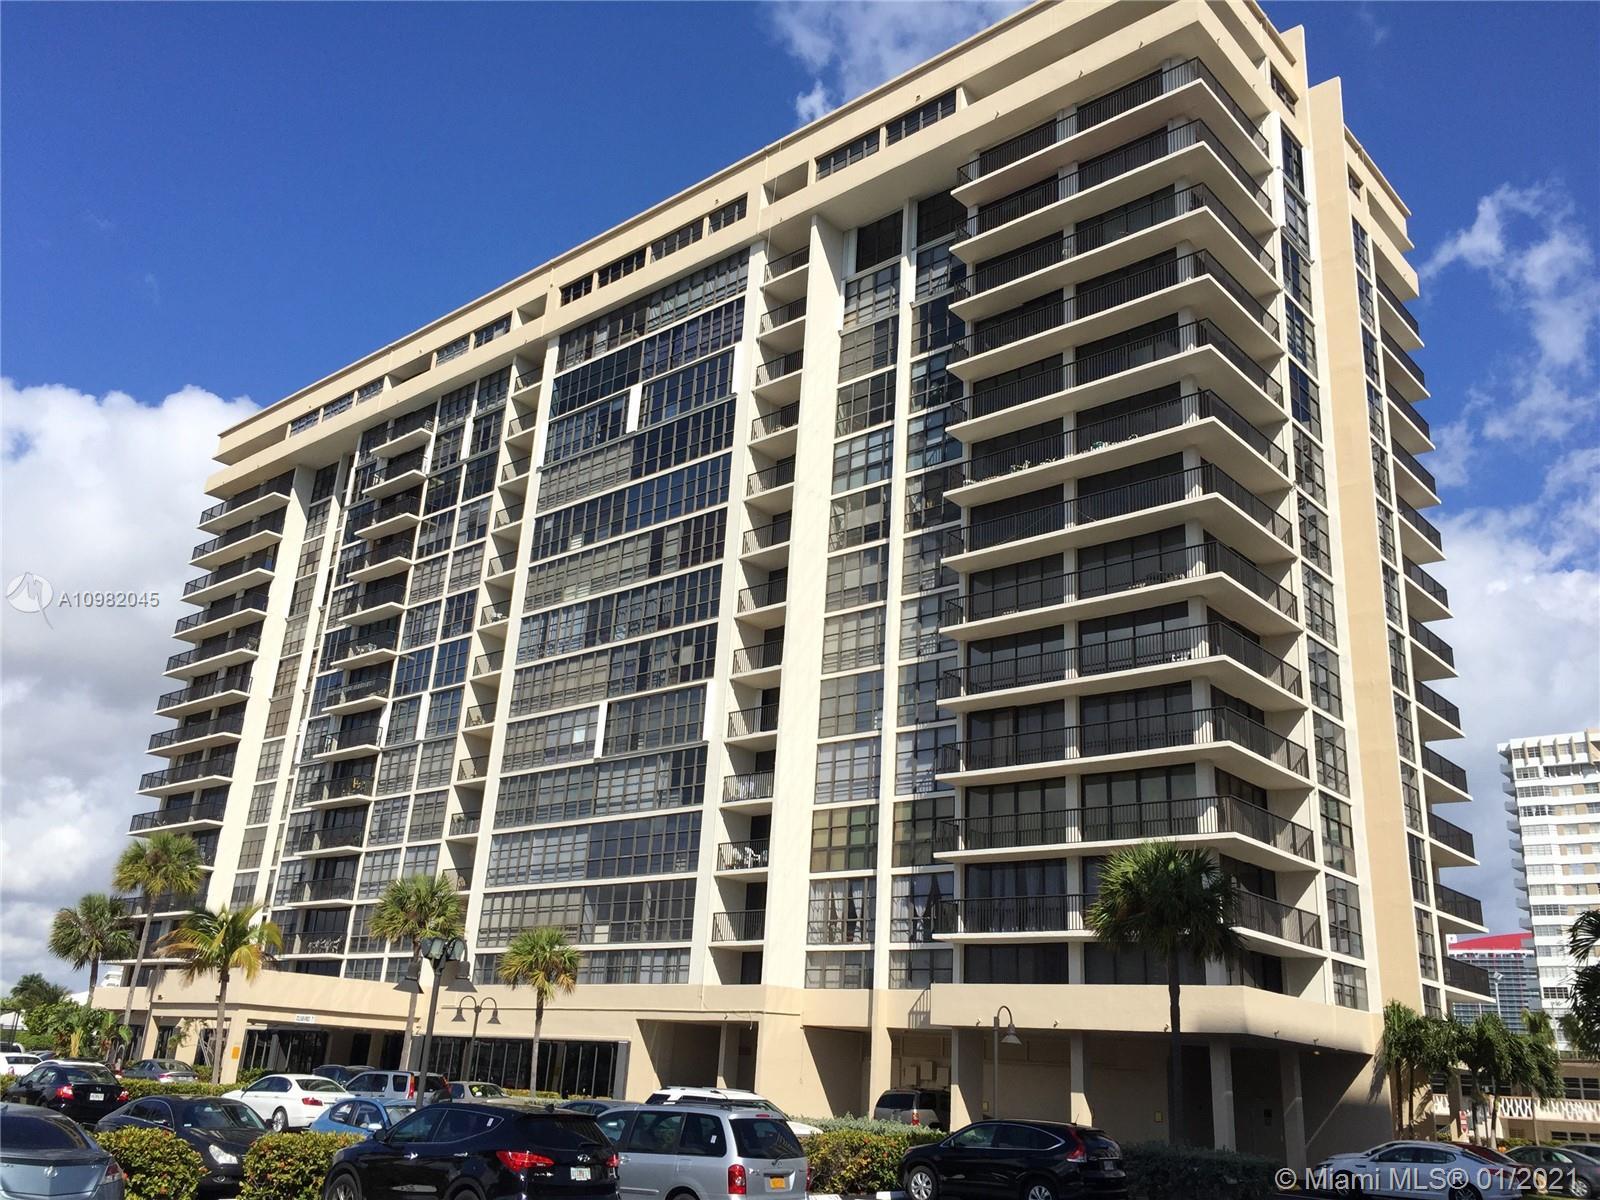 Avant Garde One #305 - 2017 S Ocean Dr #305, Hallandale Beach, FL 33009